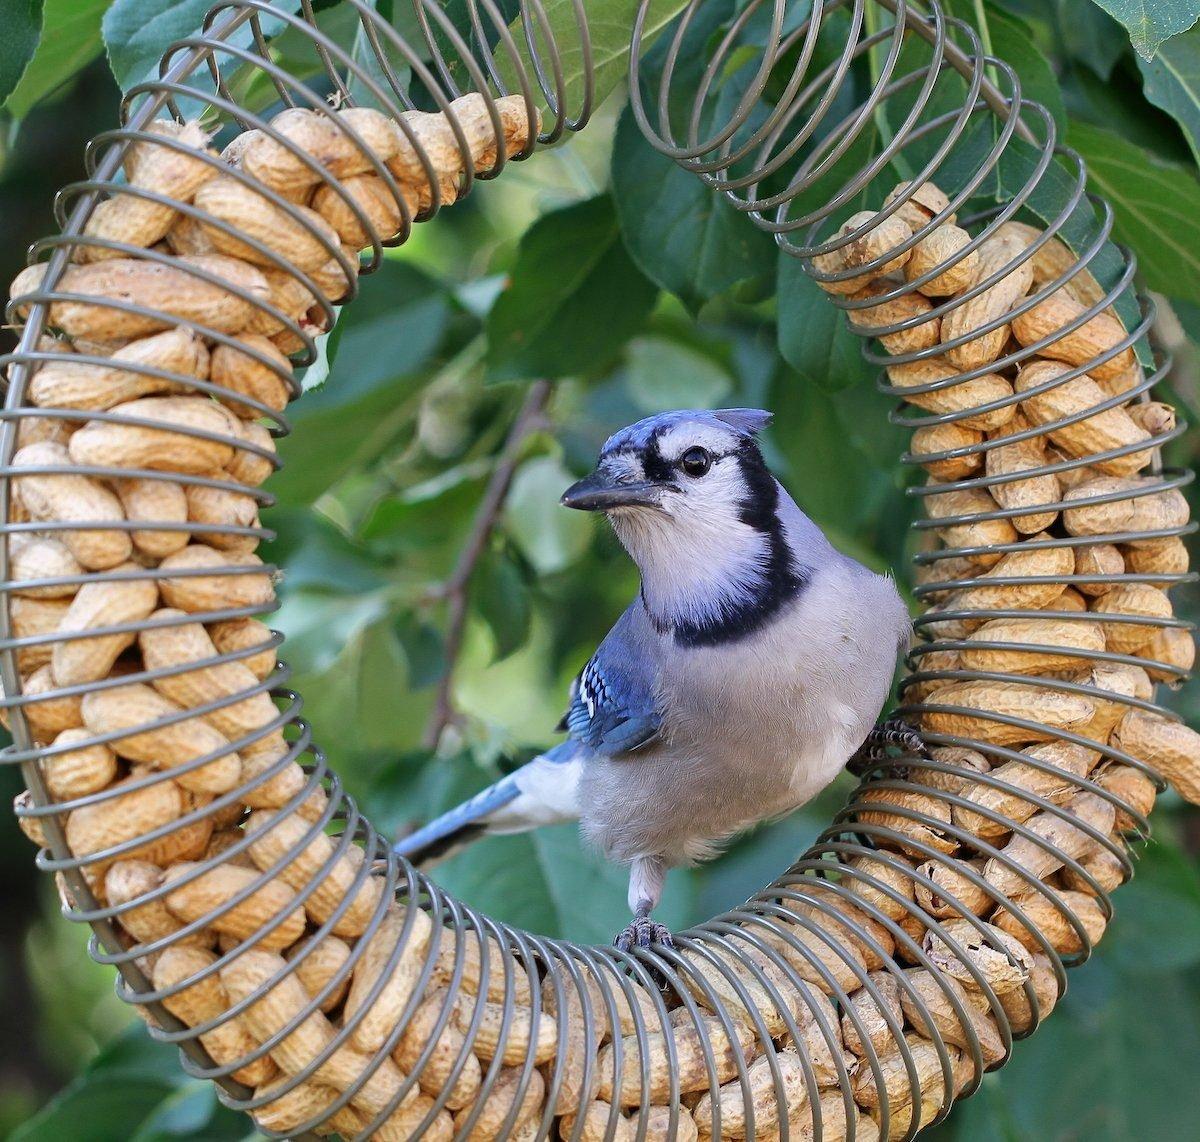 Blue jay on peanut bird feeder